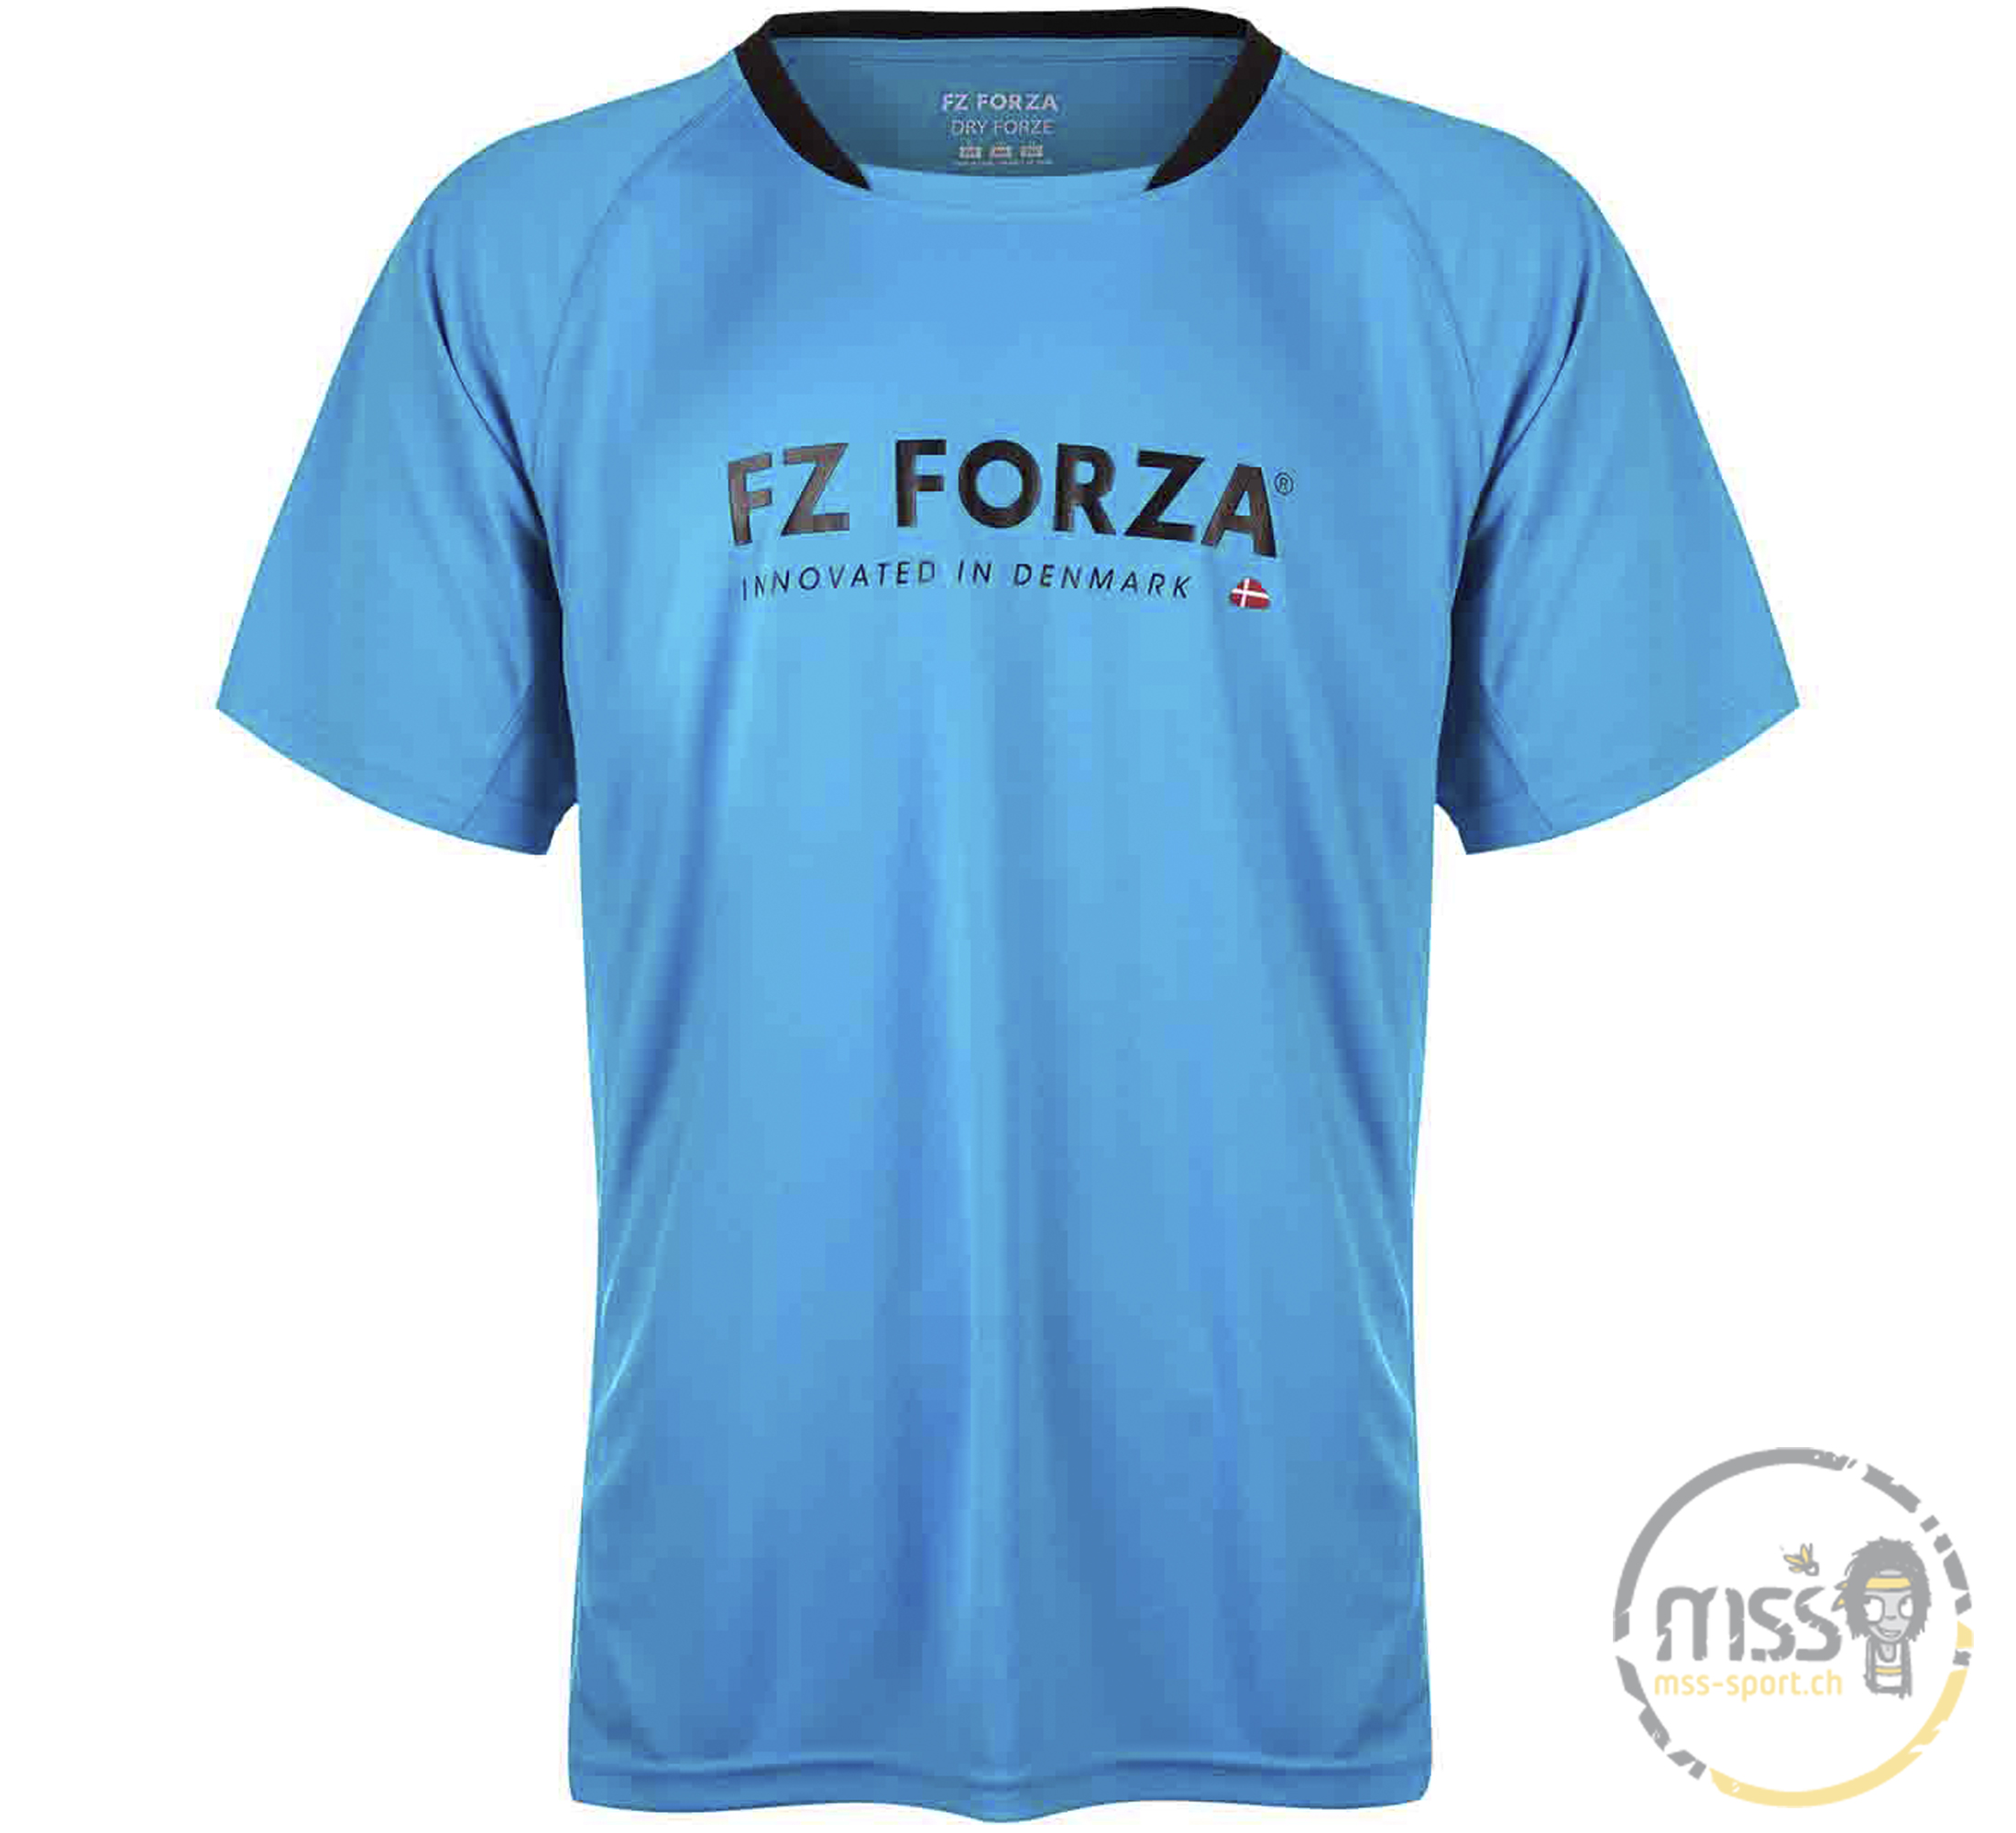 Forza Shirt Bling Tee atomic blue